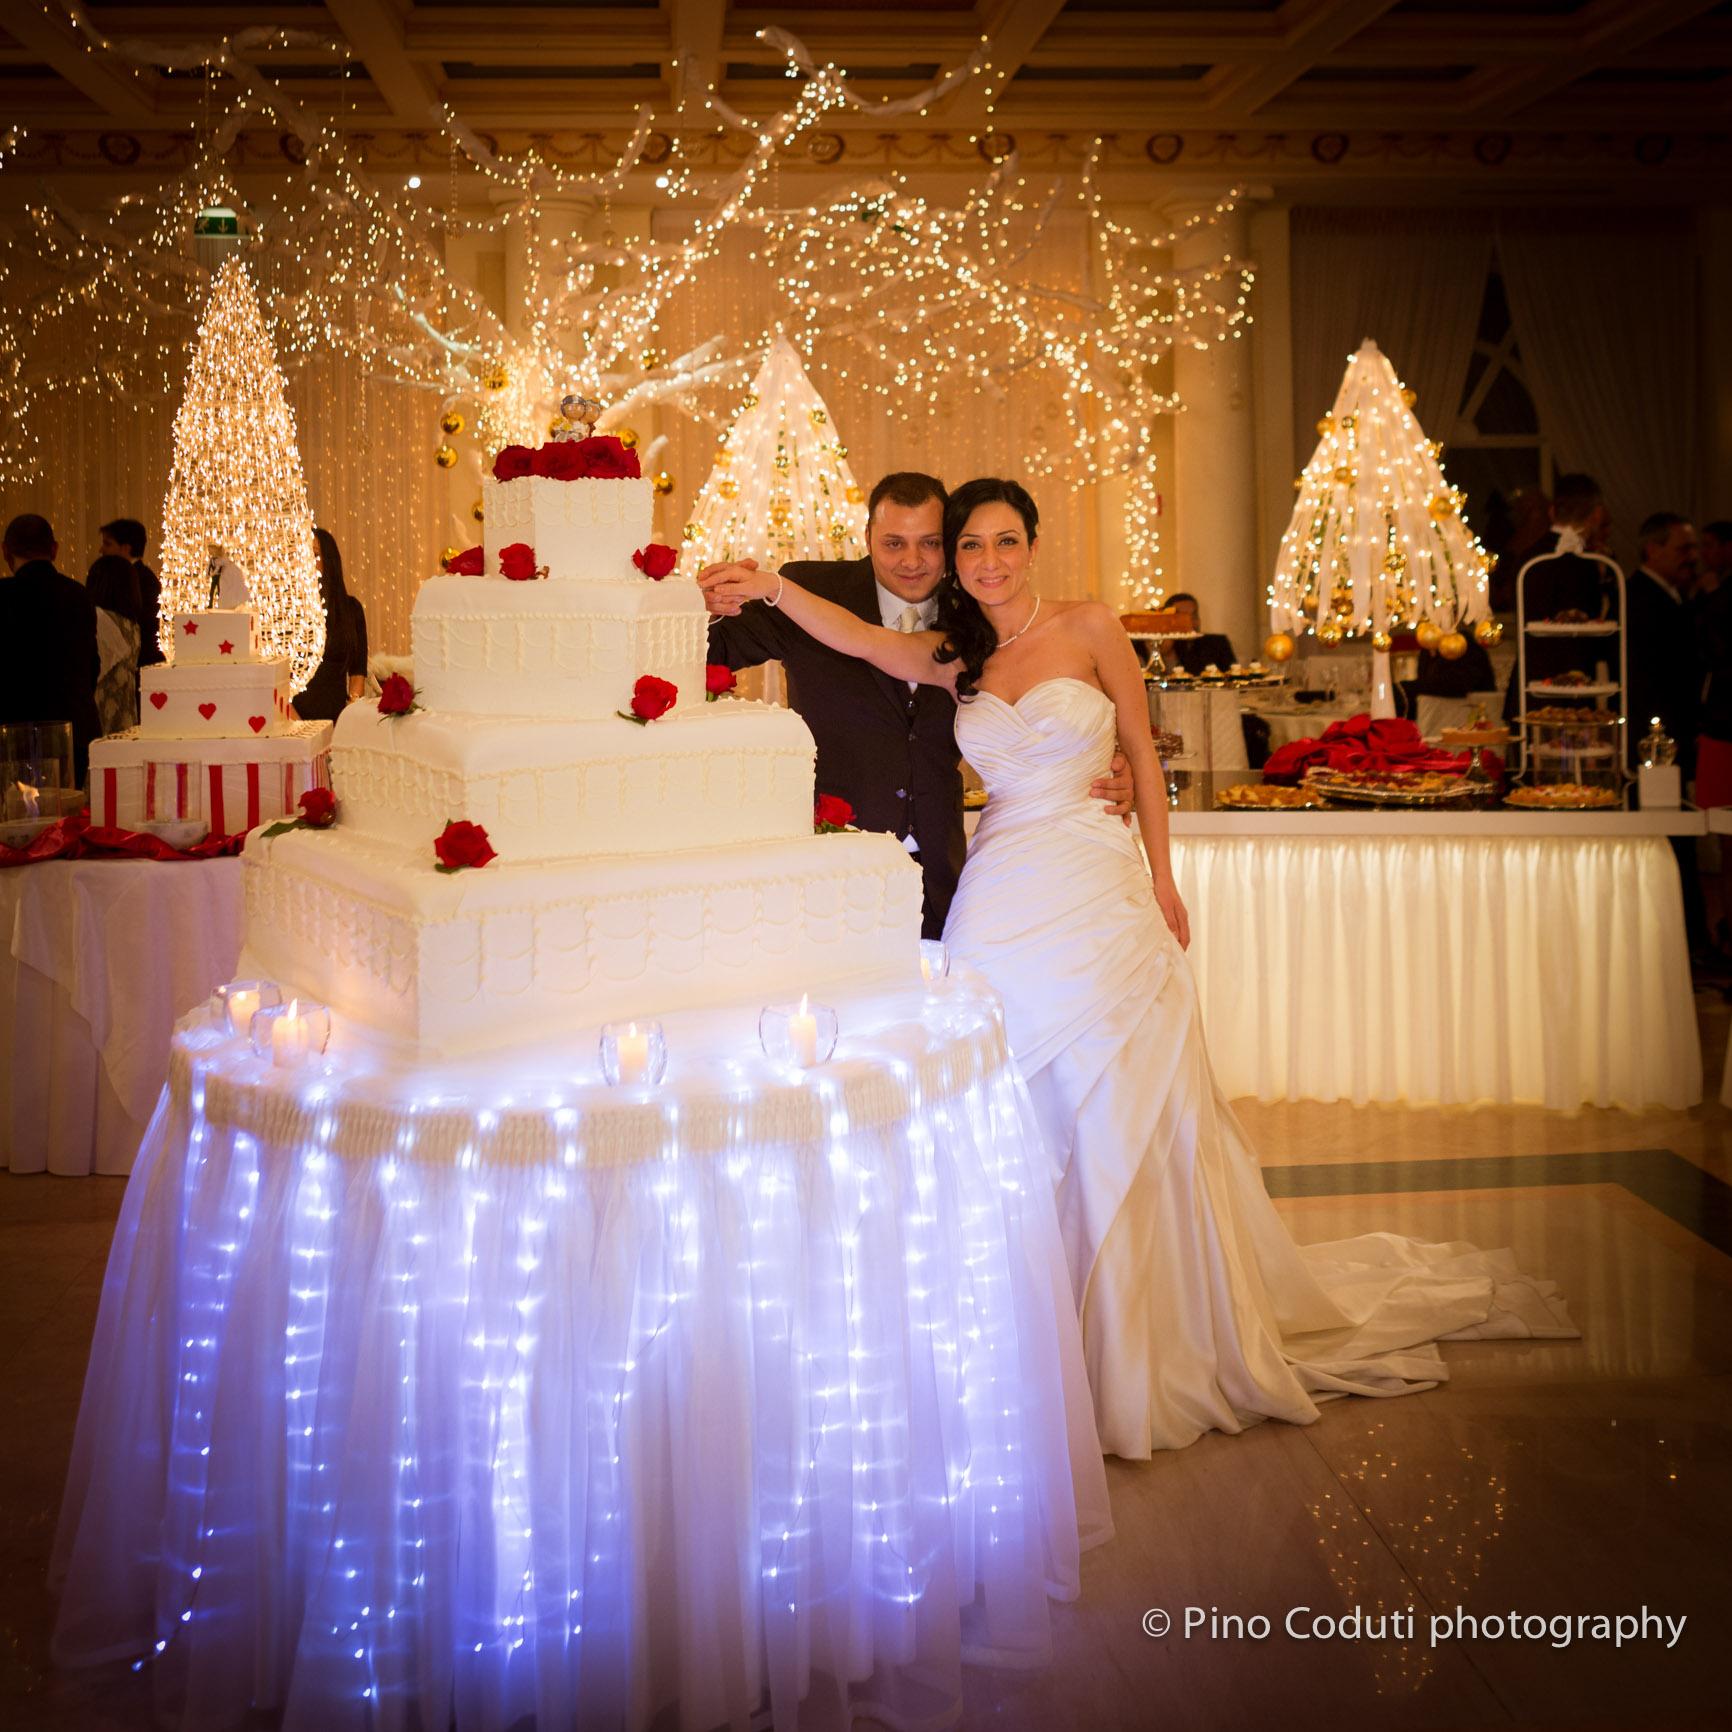 Matrimonio Natale Puglia : Torta nuziale natalizia matrimonio pino coduti